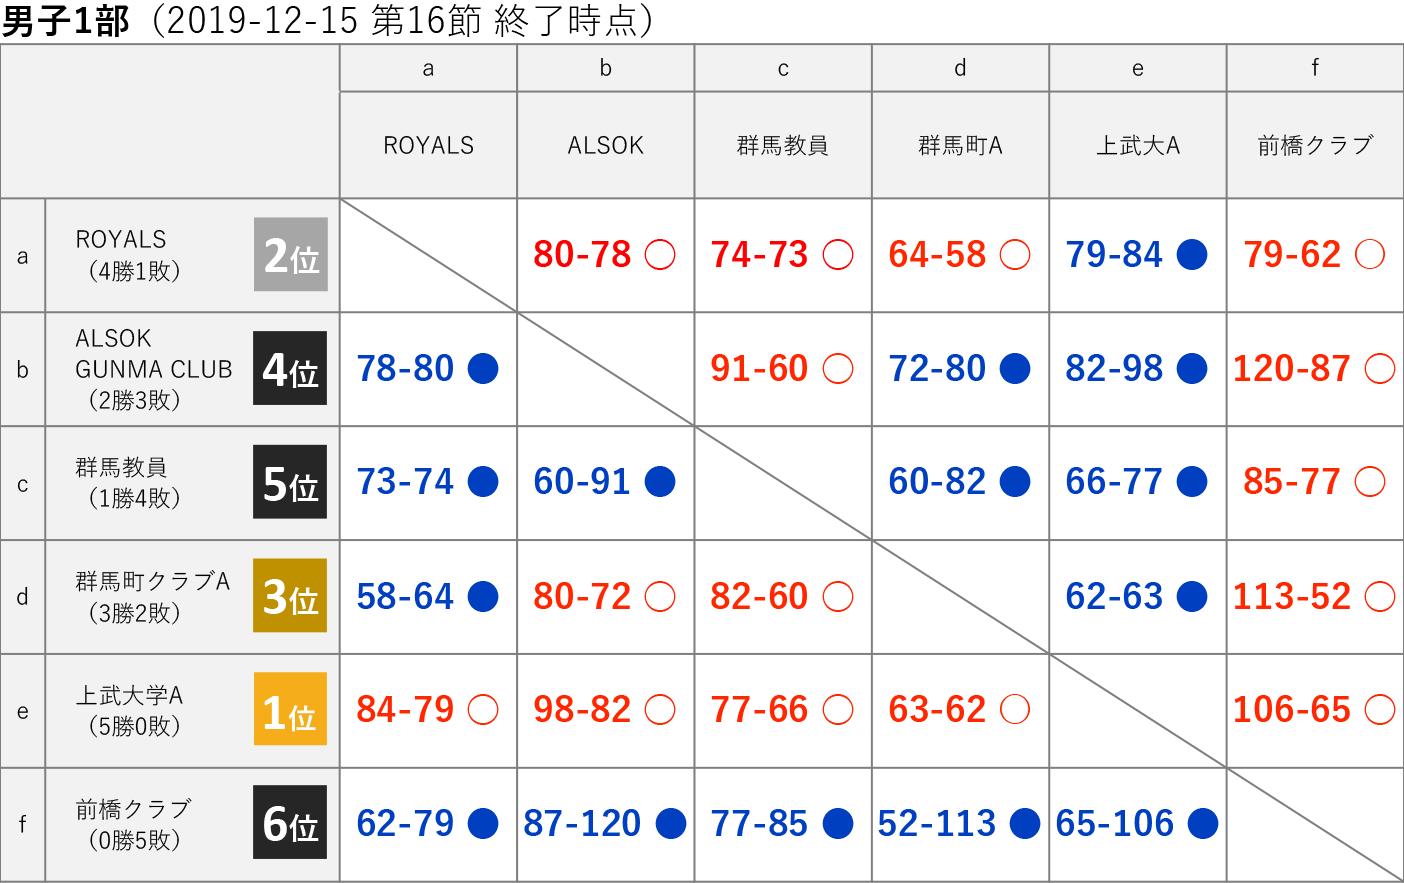 男子1部 星取り表 2019-12-15(日程終了)